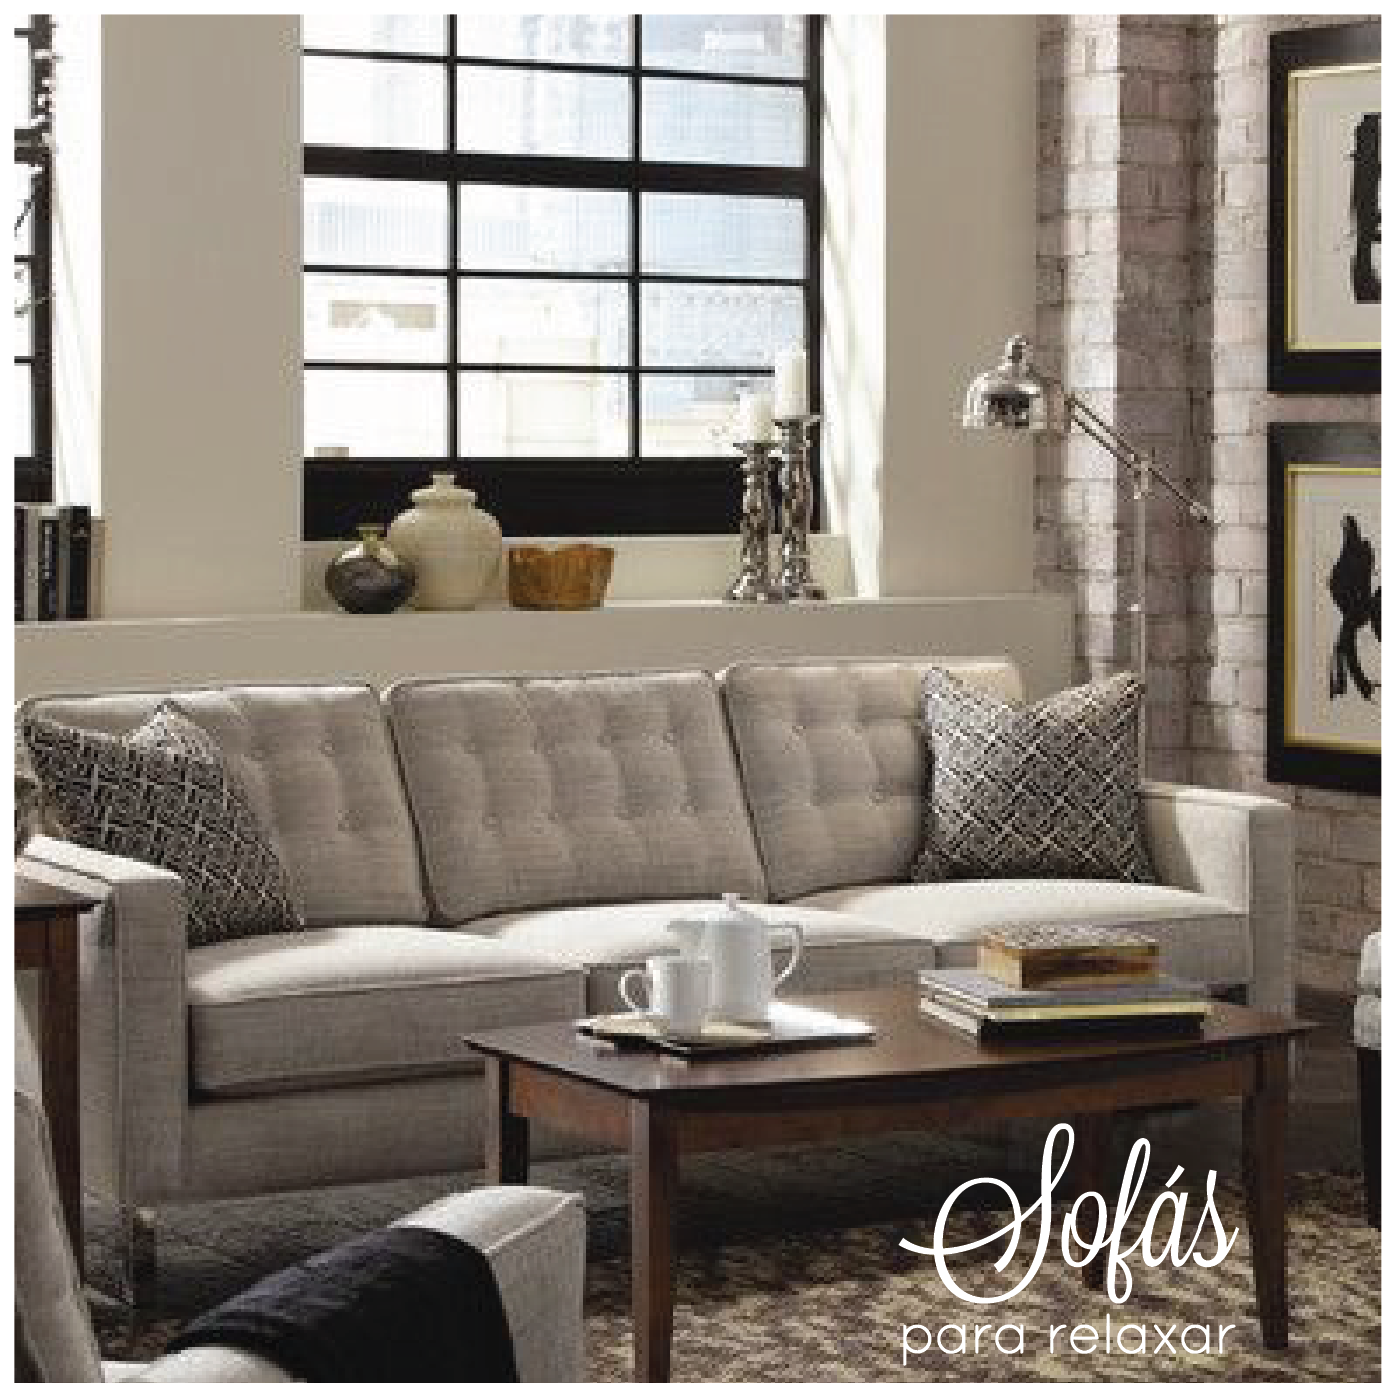 Casa das amigas sof s para relaxar casa das amigas for Casas de sofas en madrid